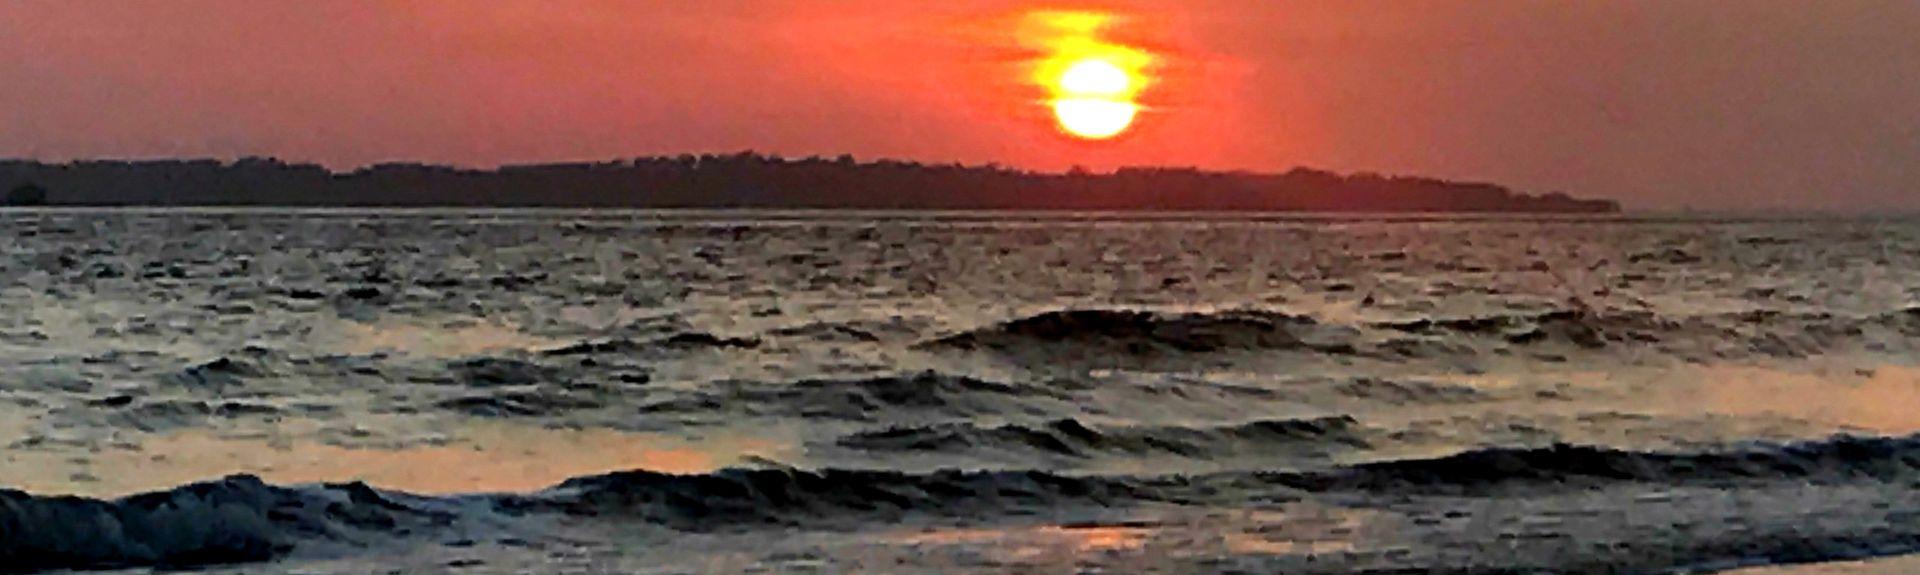 Edisto Beach State Park, Edisto Island, South Carolina, United States of America